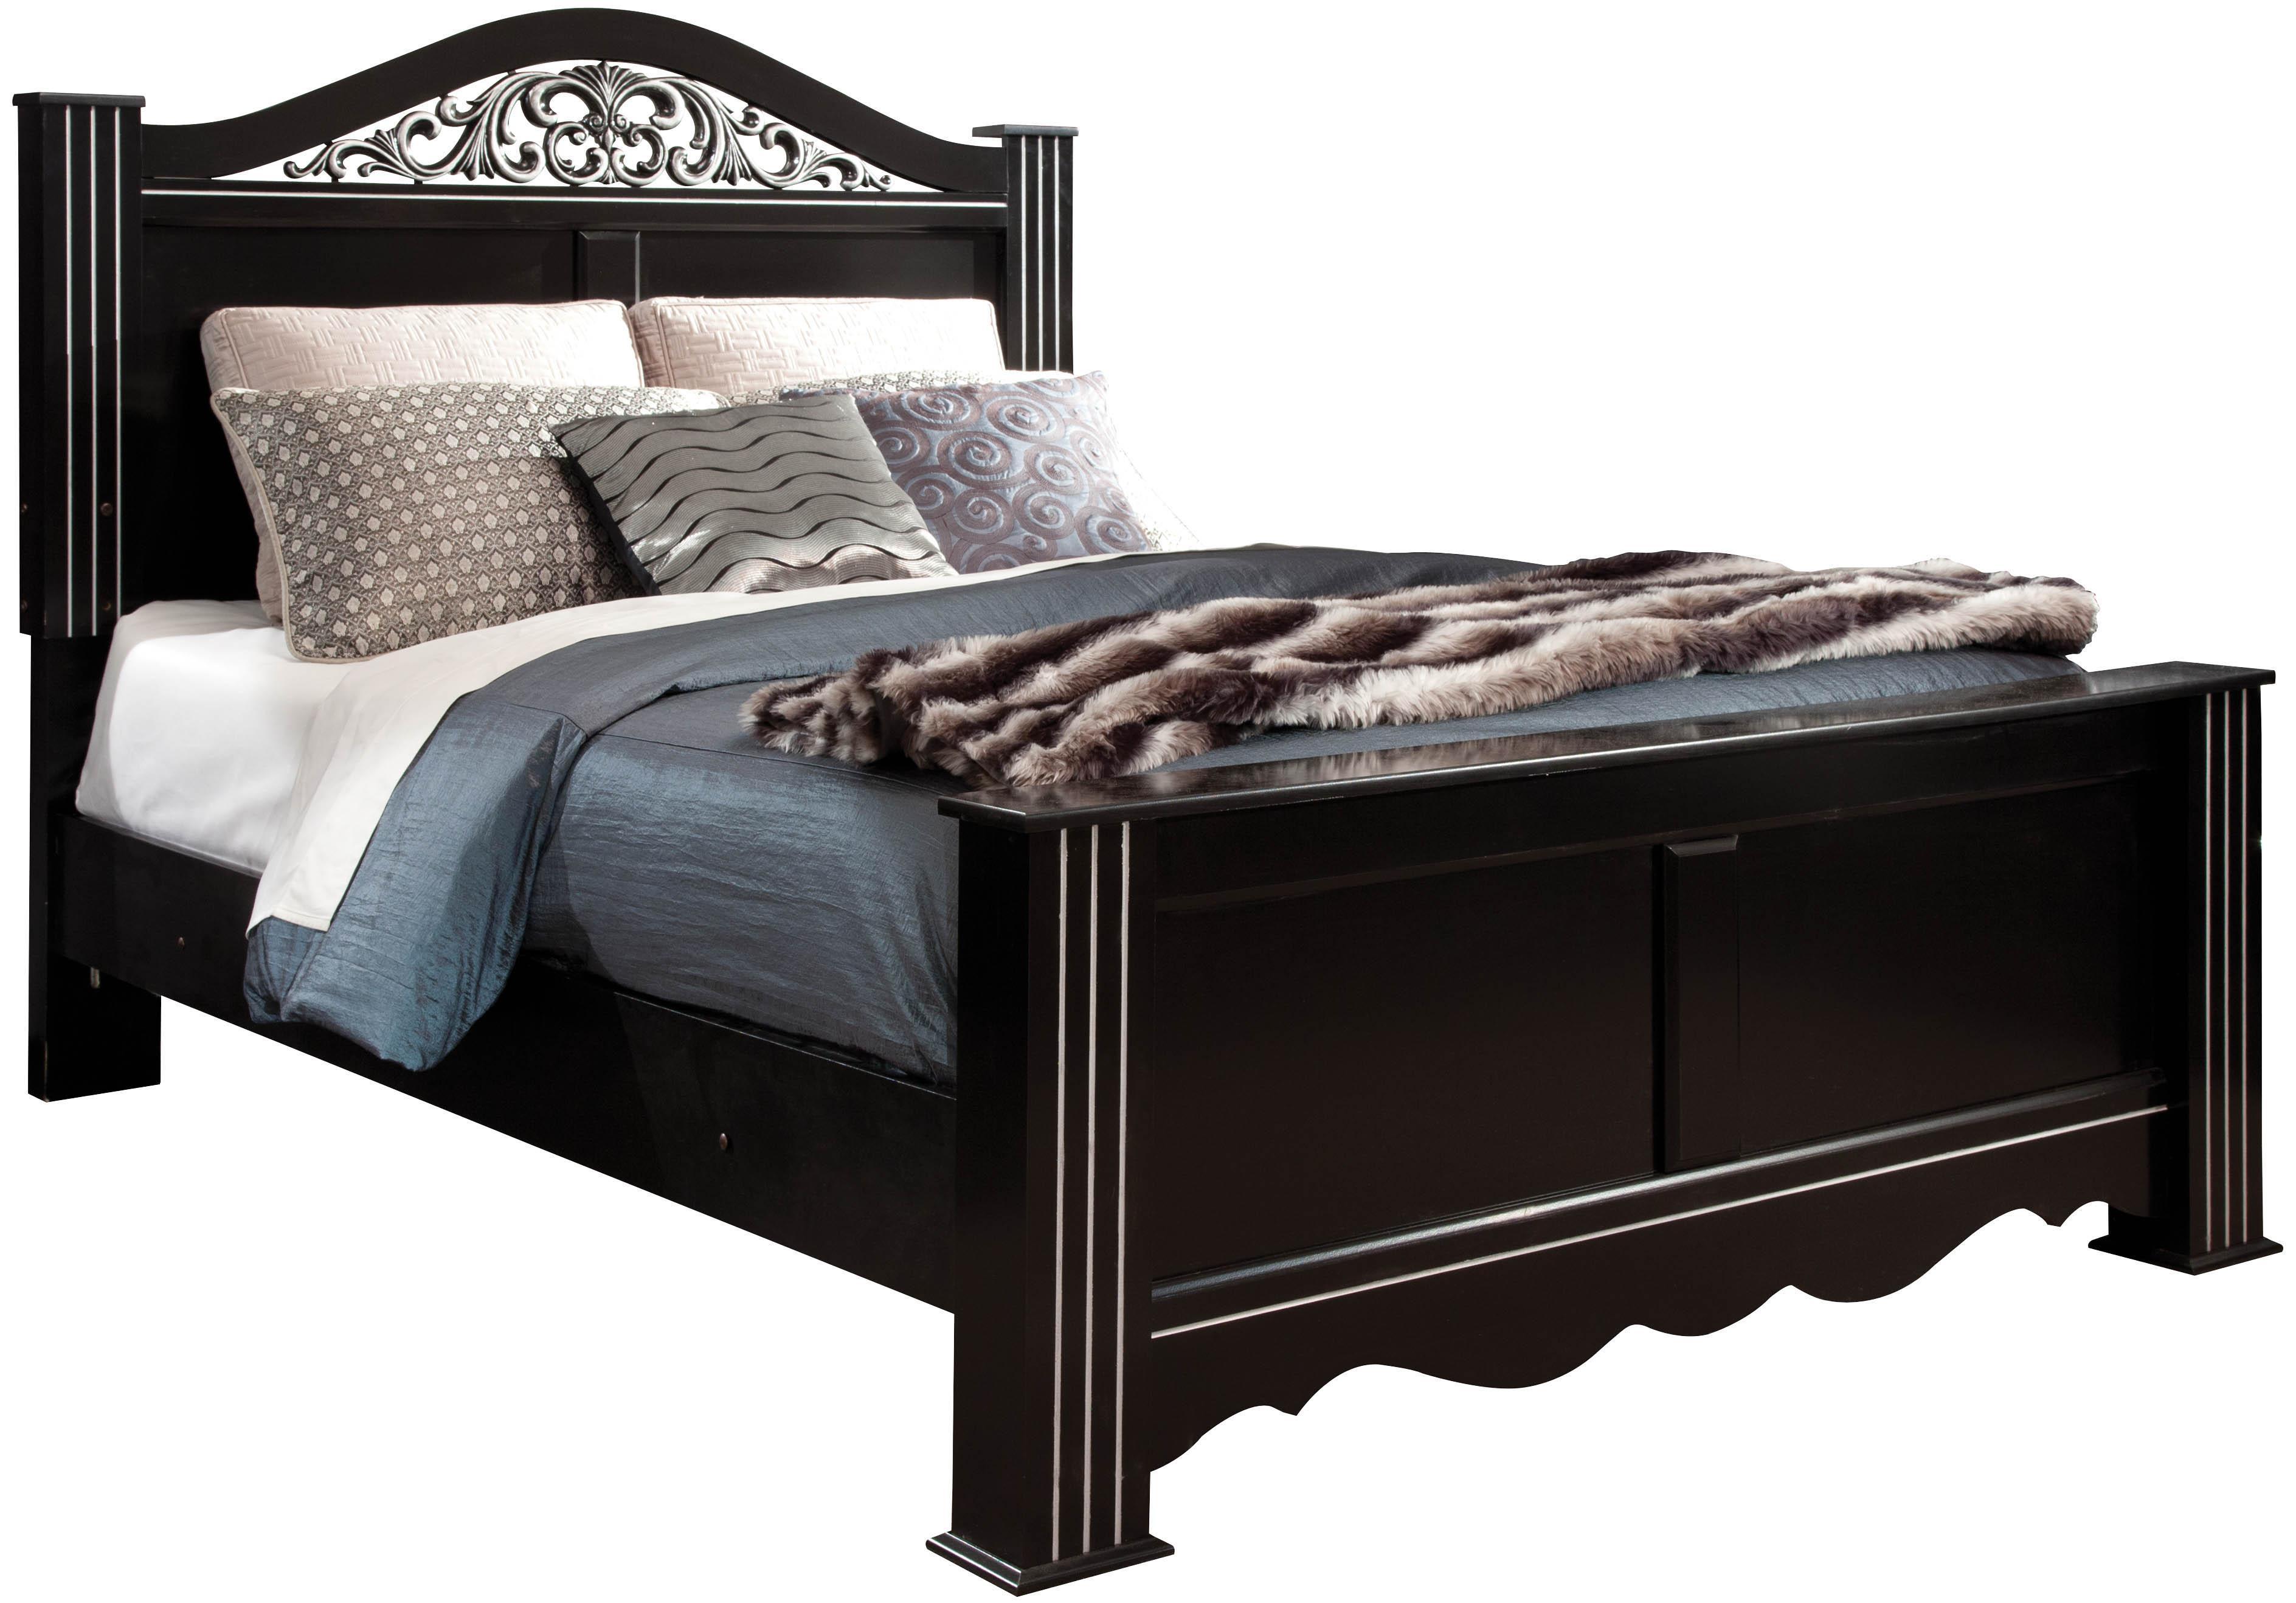 Standard Furniture Odessa Queen Poster Bed - Item Number: 69552+69562+69560